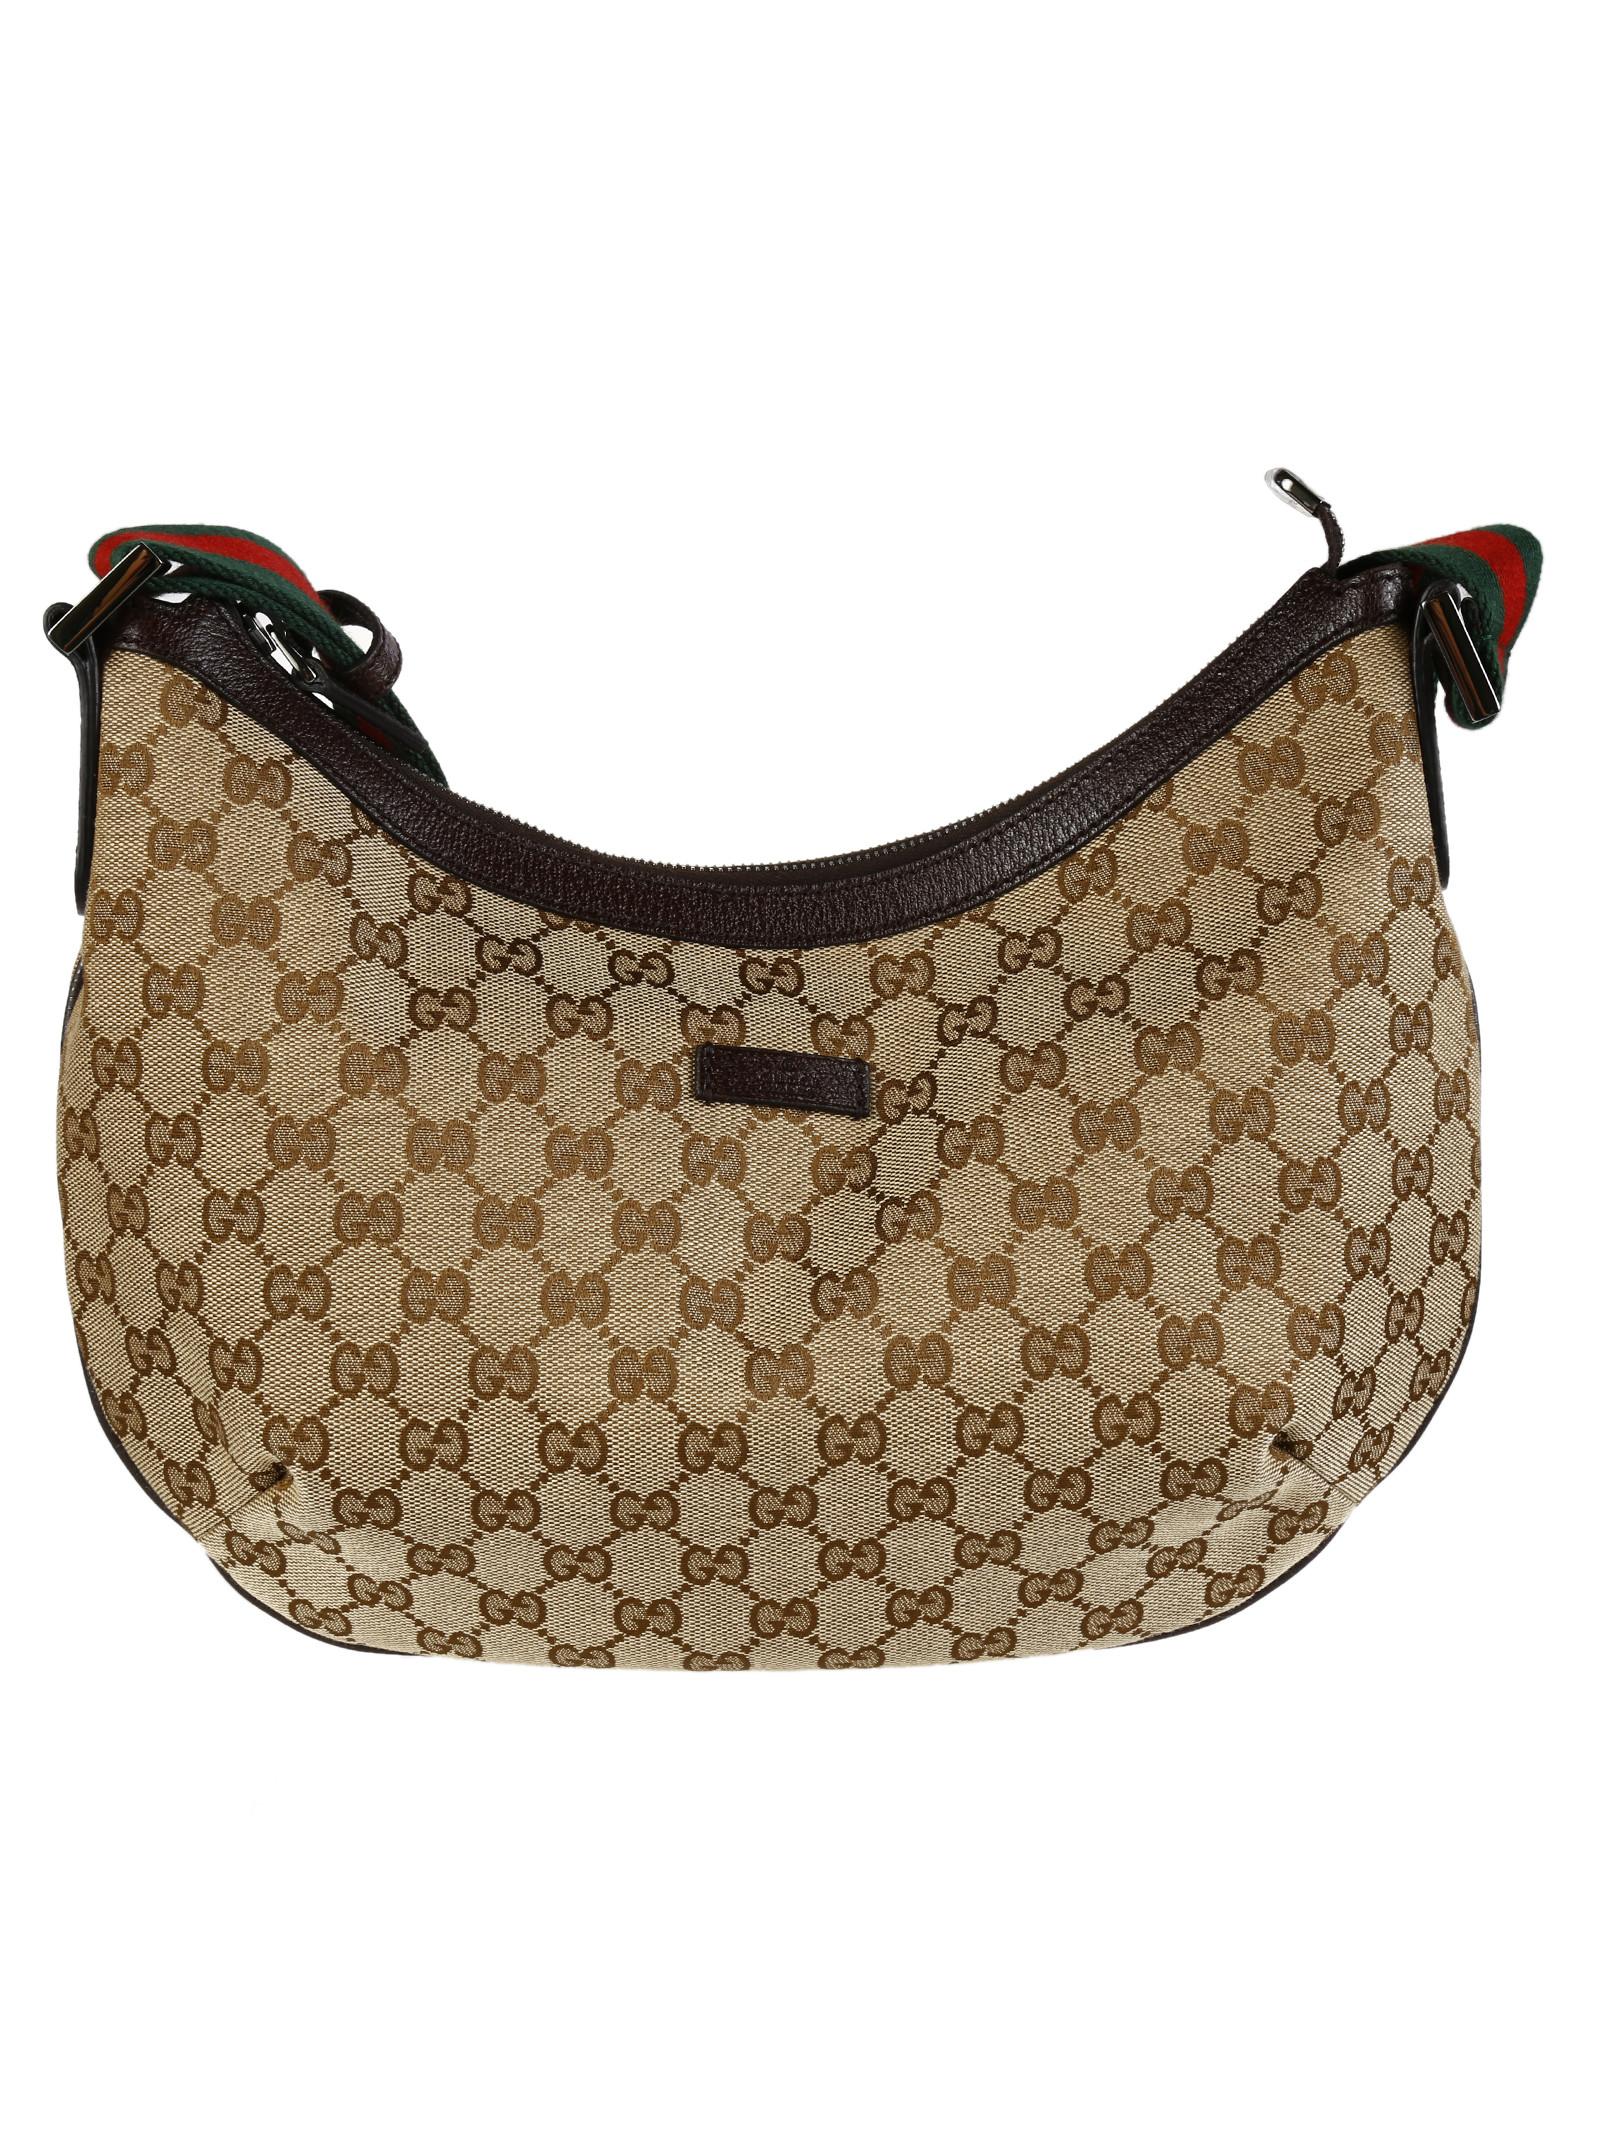 real chloe handbags - chloe calfskin large marcie satchel ebony